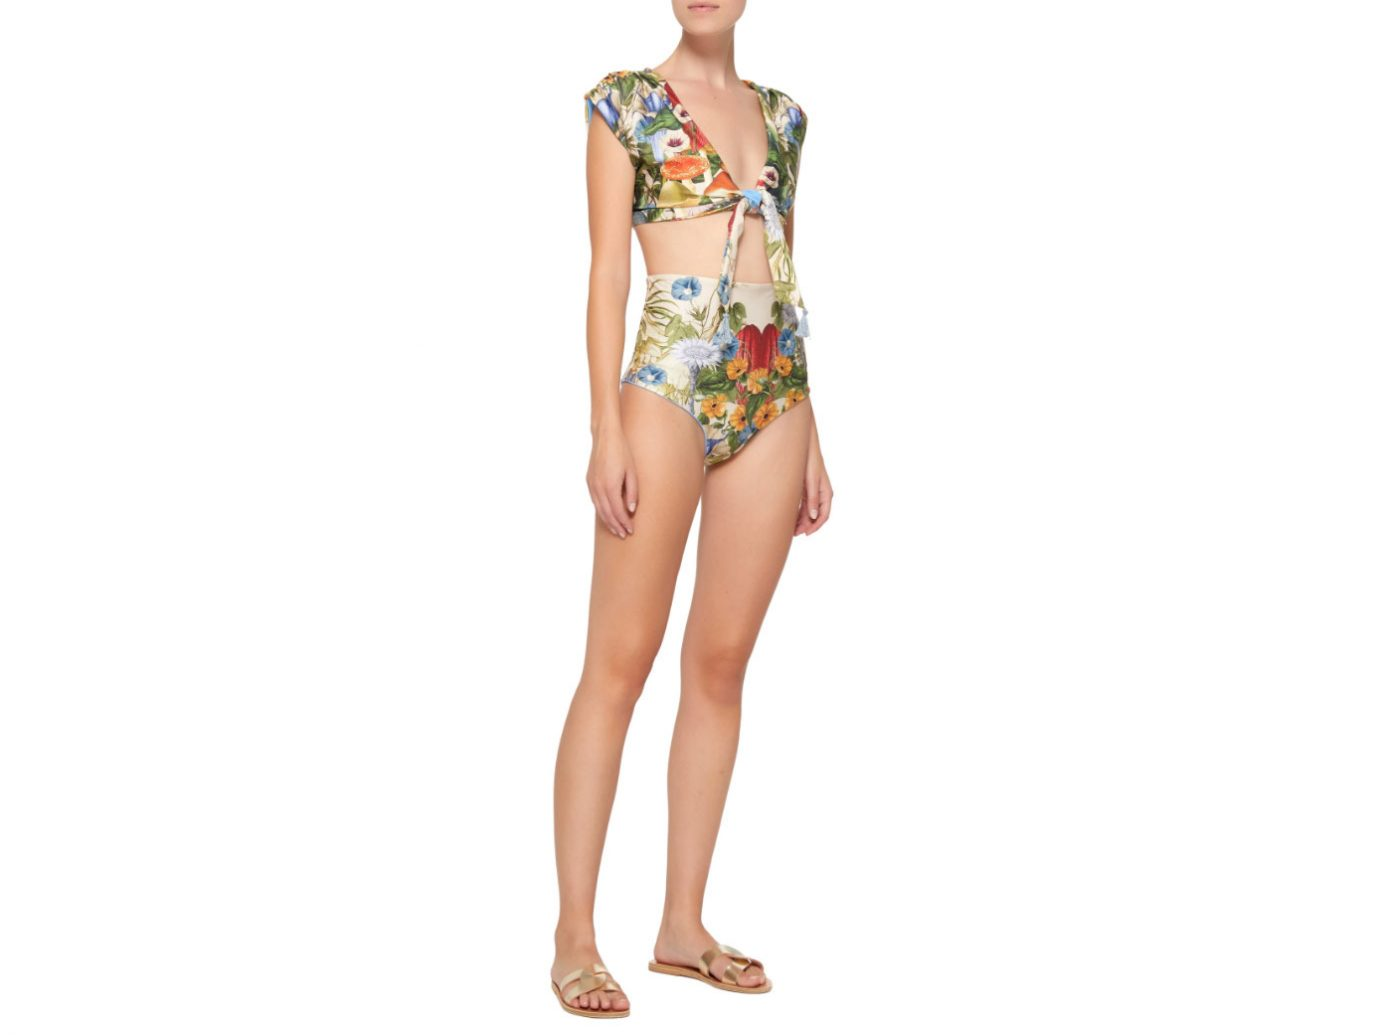 Carolina K Nina Reversible High-Waisted Bikini Set